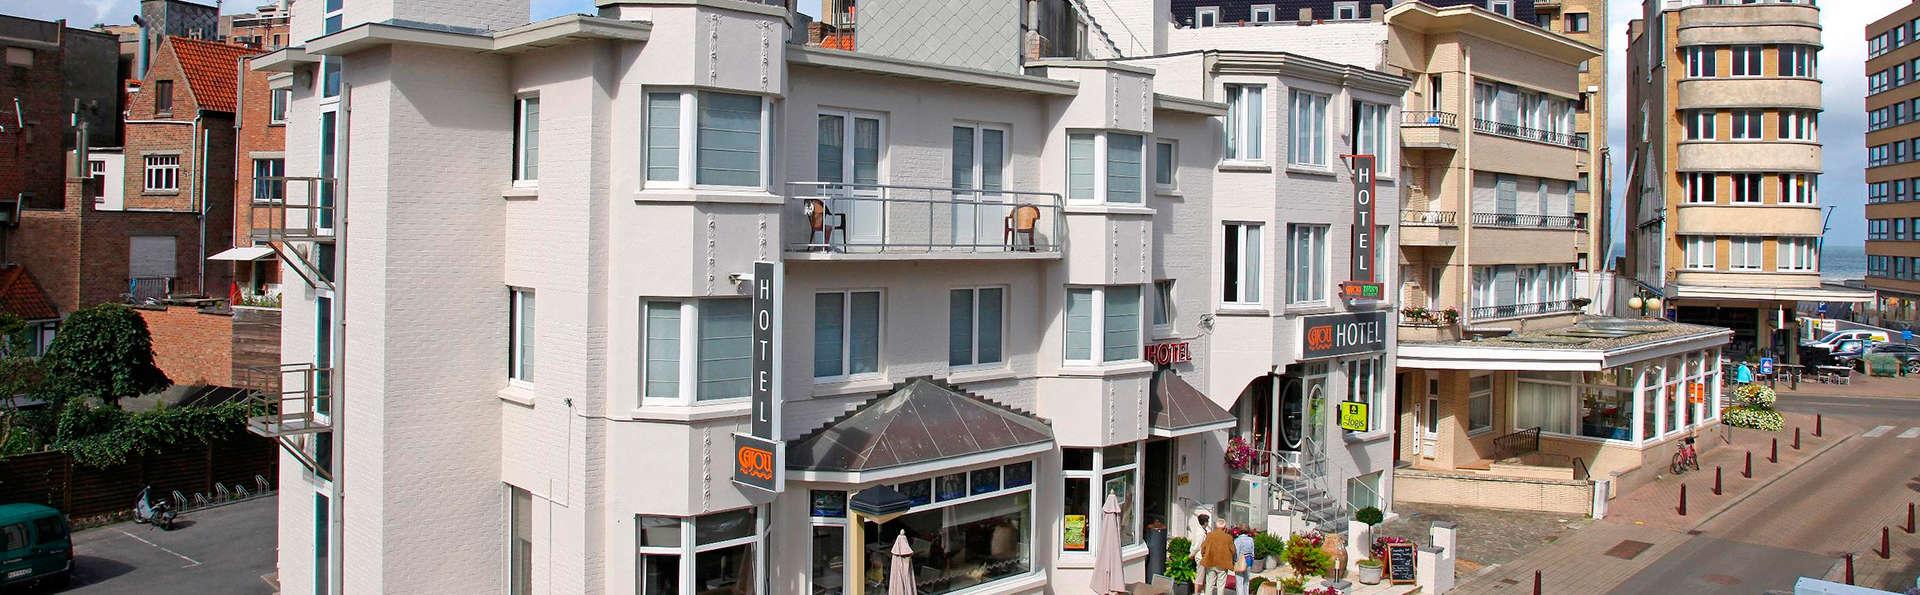 Cajou Hotel - EDIT_front.jpg